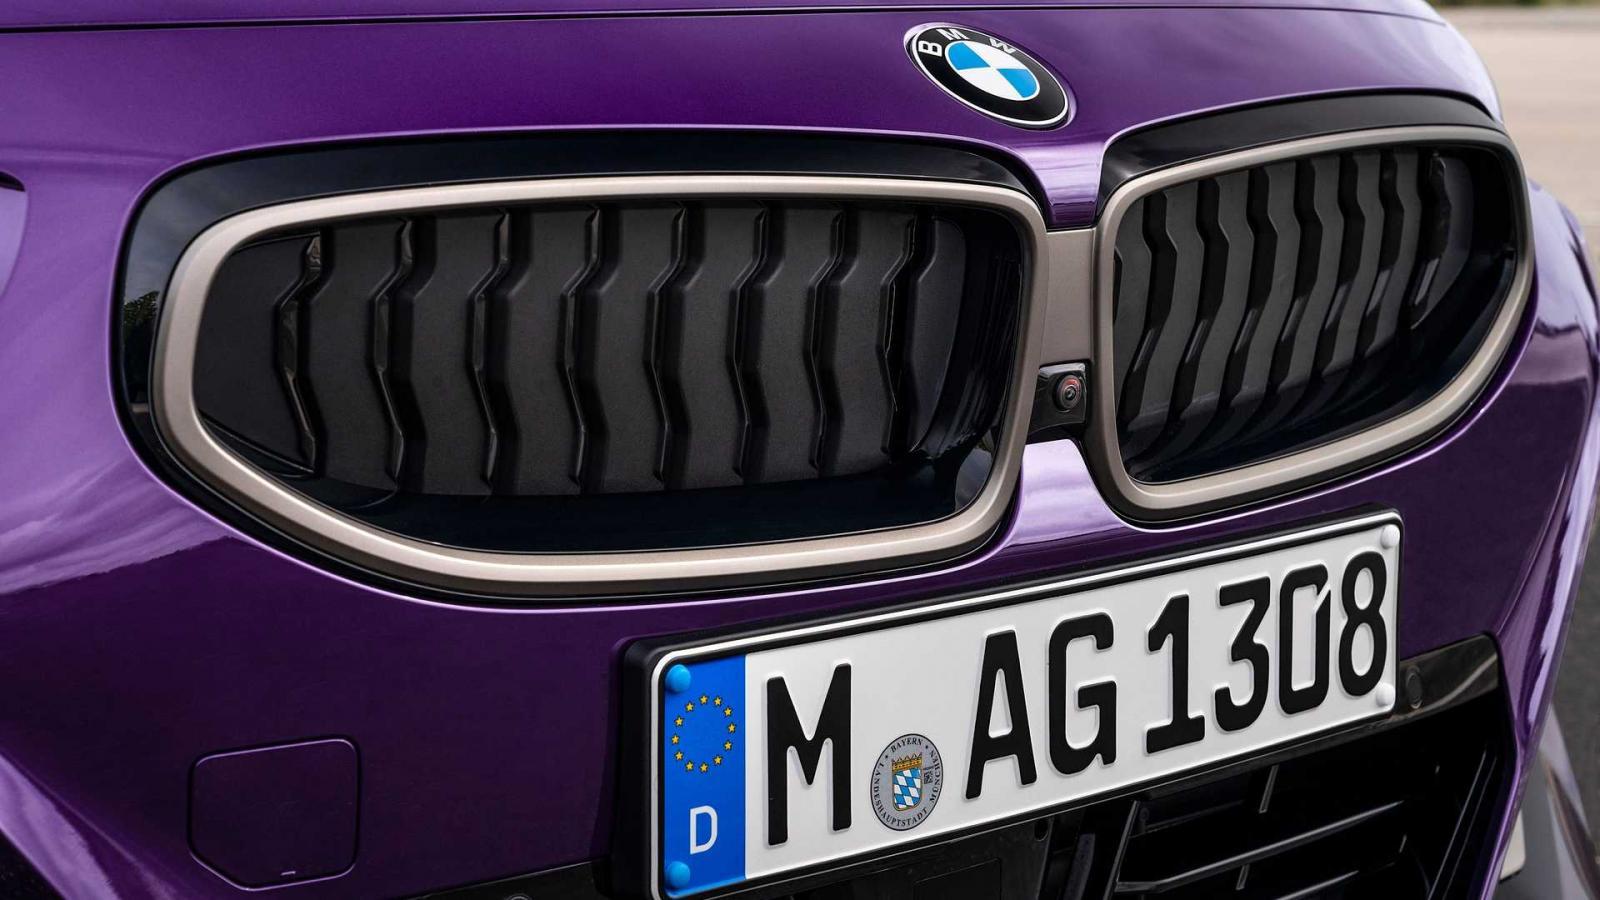 BMW 신형 2시리즈 쿠페(G42) 공식 사진(데이터 주의)